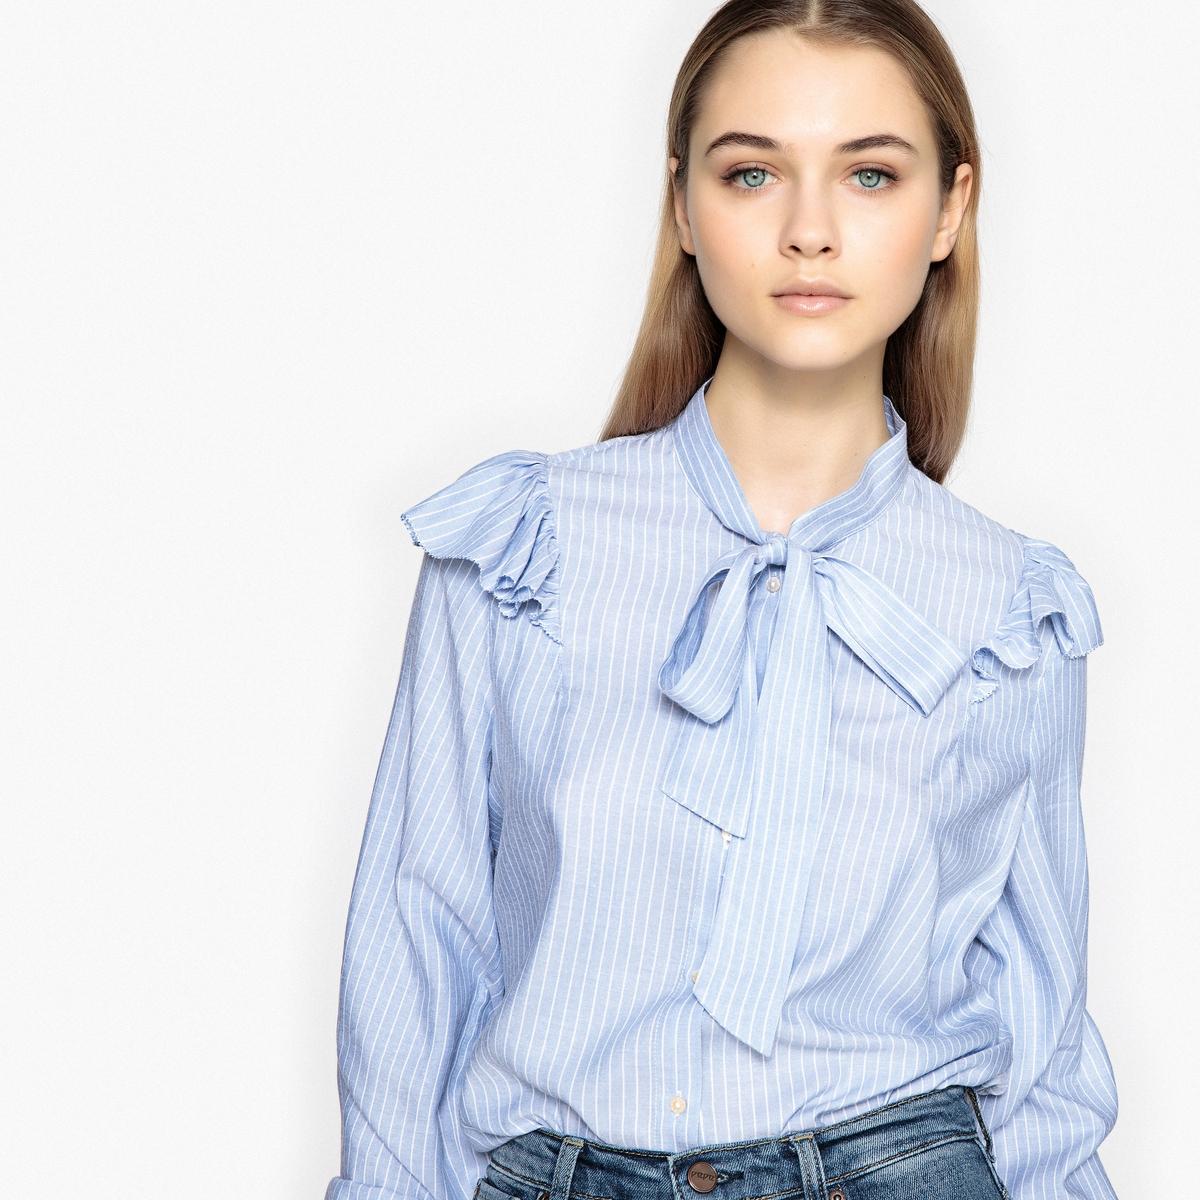 Рубашка La Redoute Прямого покроя с галстуком-бантом и длинными рукавами S синий рубашка la redoute джинсовая узкая jjesheridan s синий